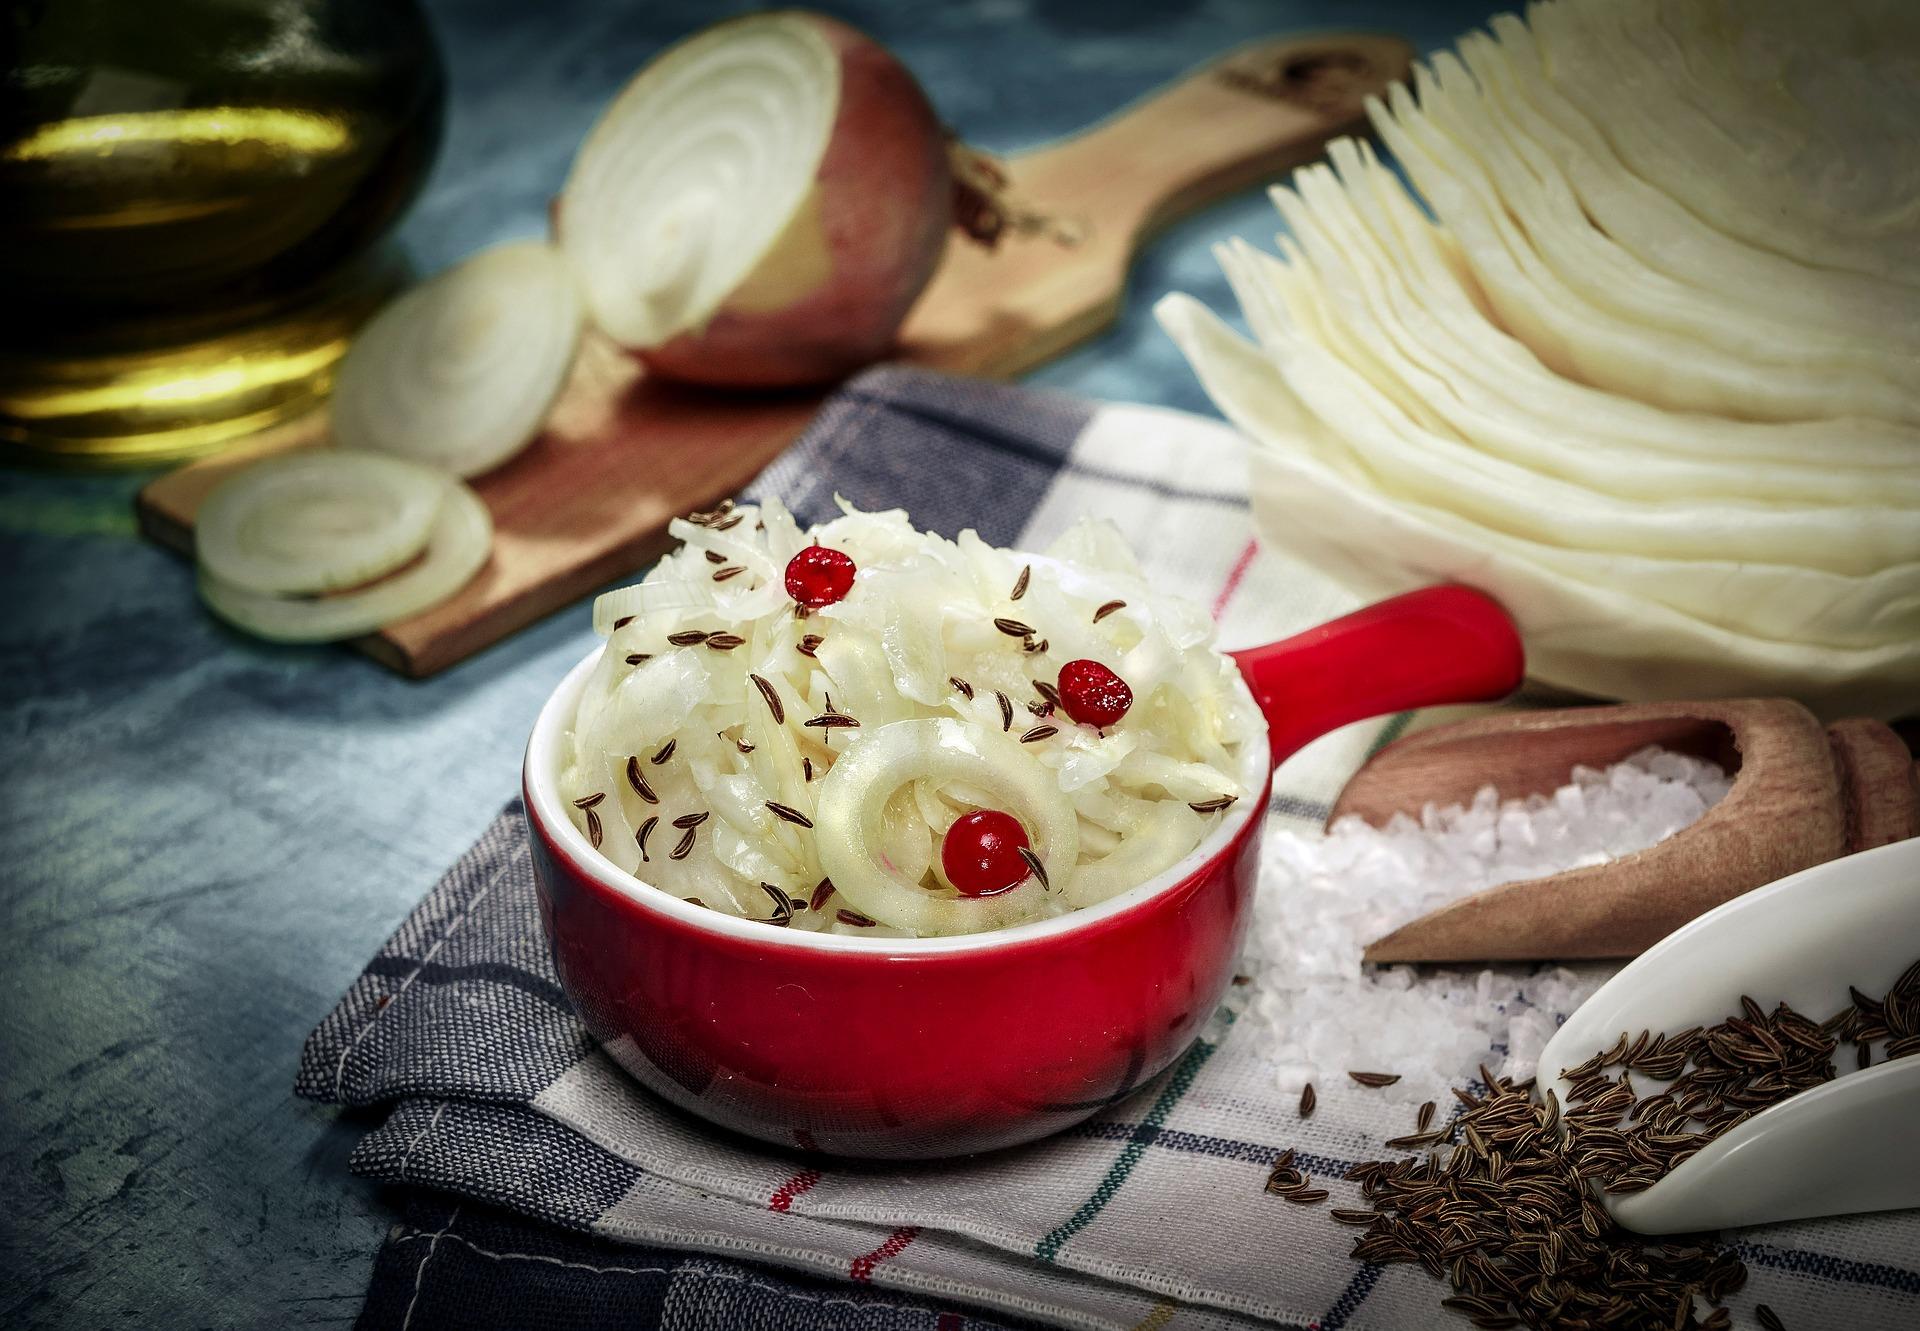 Grundrezept: Sauerkraut selbst machen